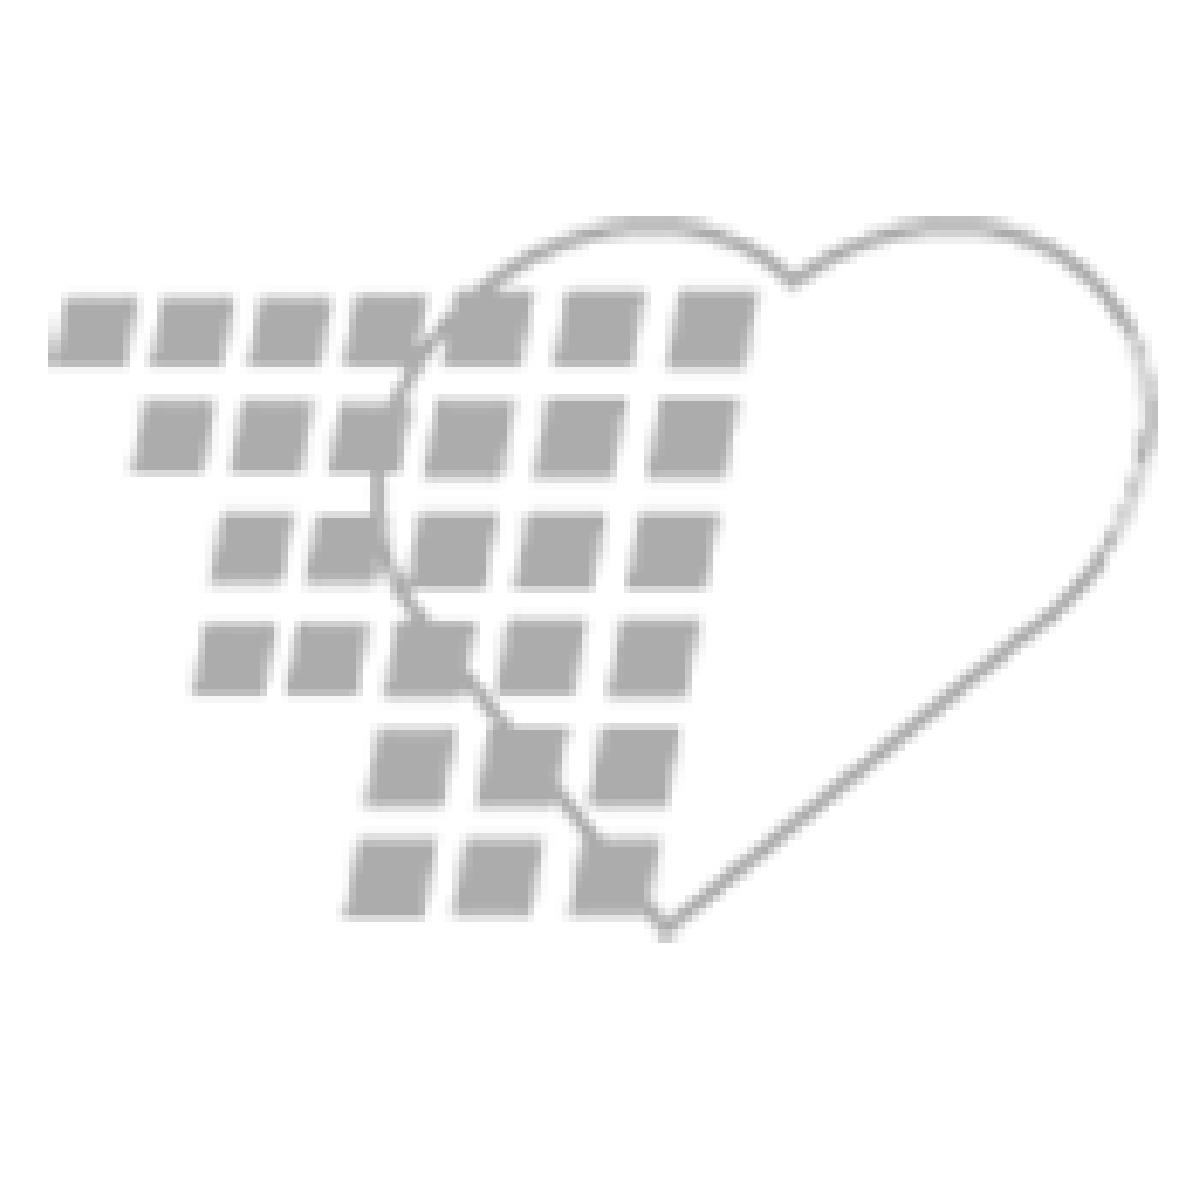 10-81-8624 Demo Dose® Inject-Ed Pad